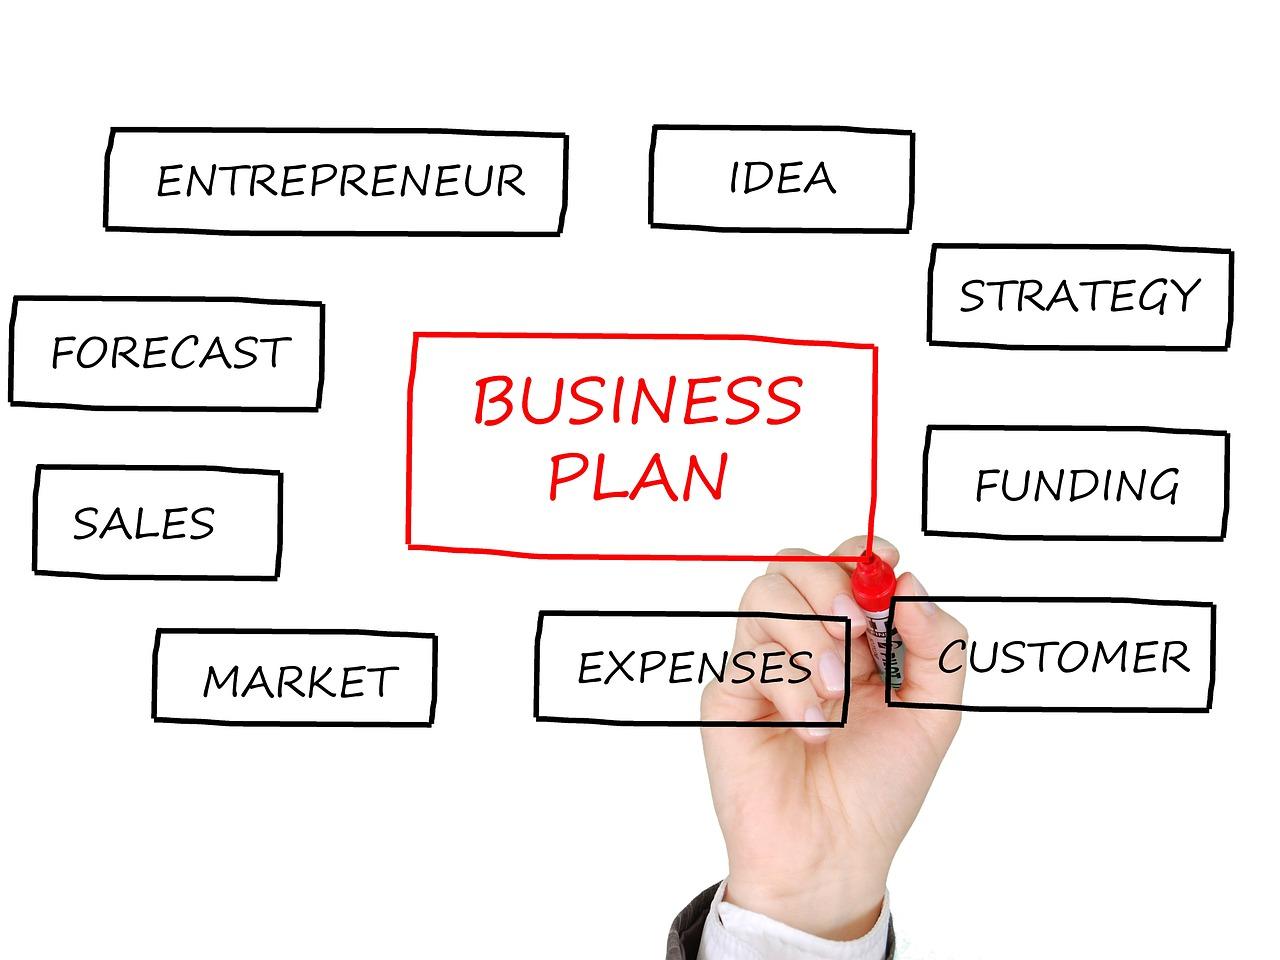 https://pixabay.com/en/business-plan-business-planning-2061633/